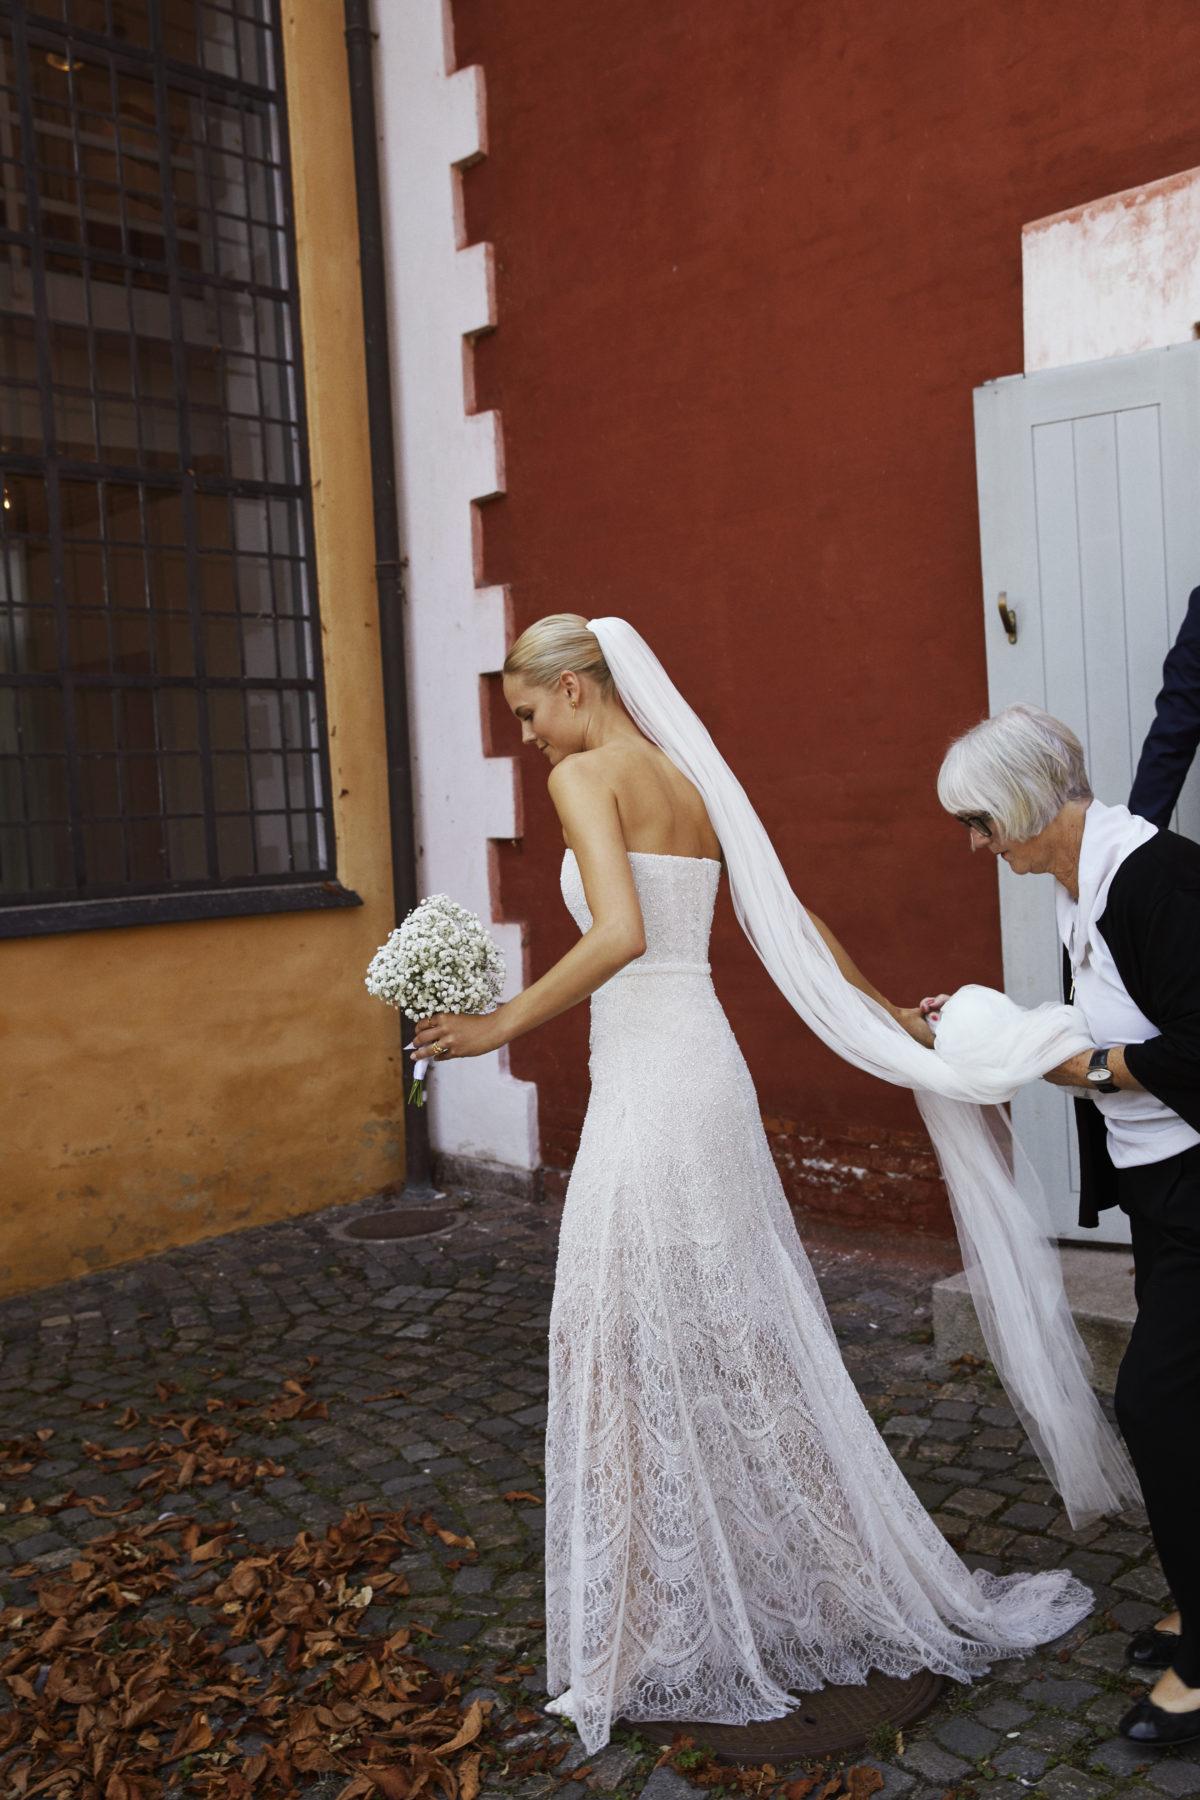 Josefine Nielsen_Mikkel Vibe_A table story